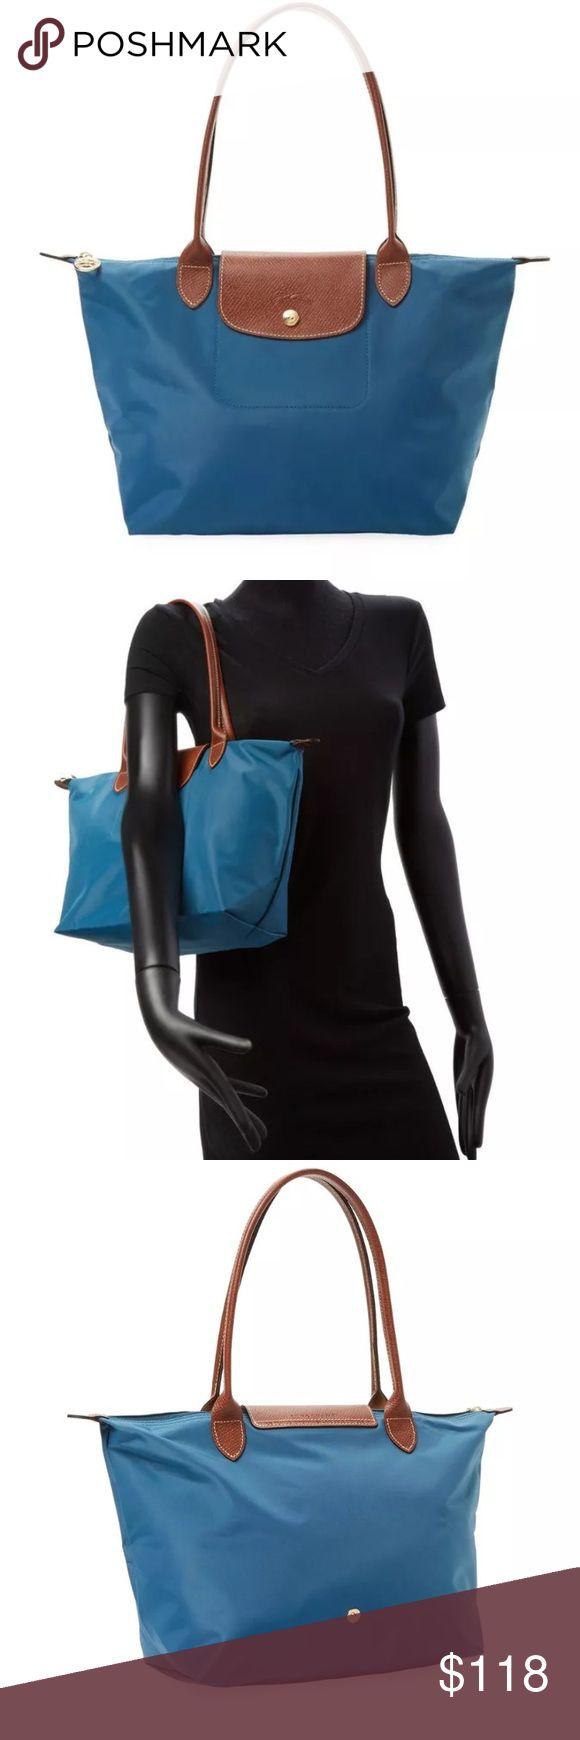 Longchamp le pilage nylon medium tote Longchamp nylon medium tote in peacock. Famous bag carried by Kate Middleton! Longchamp Bags Totes